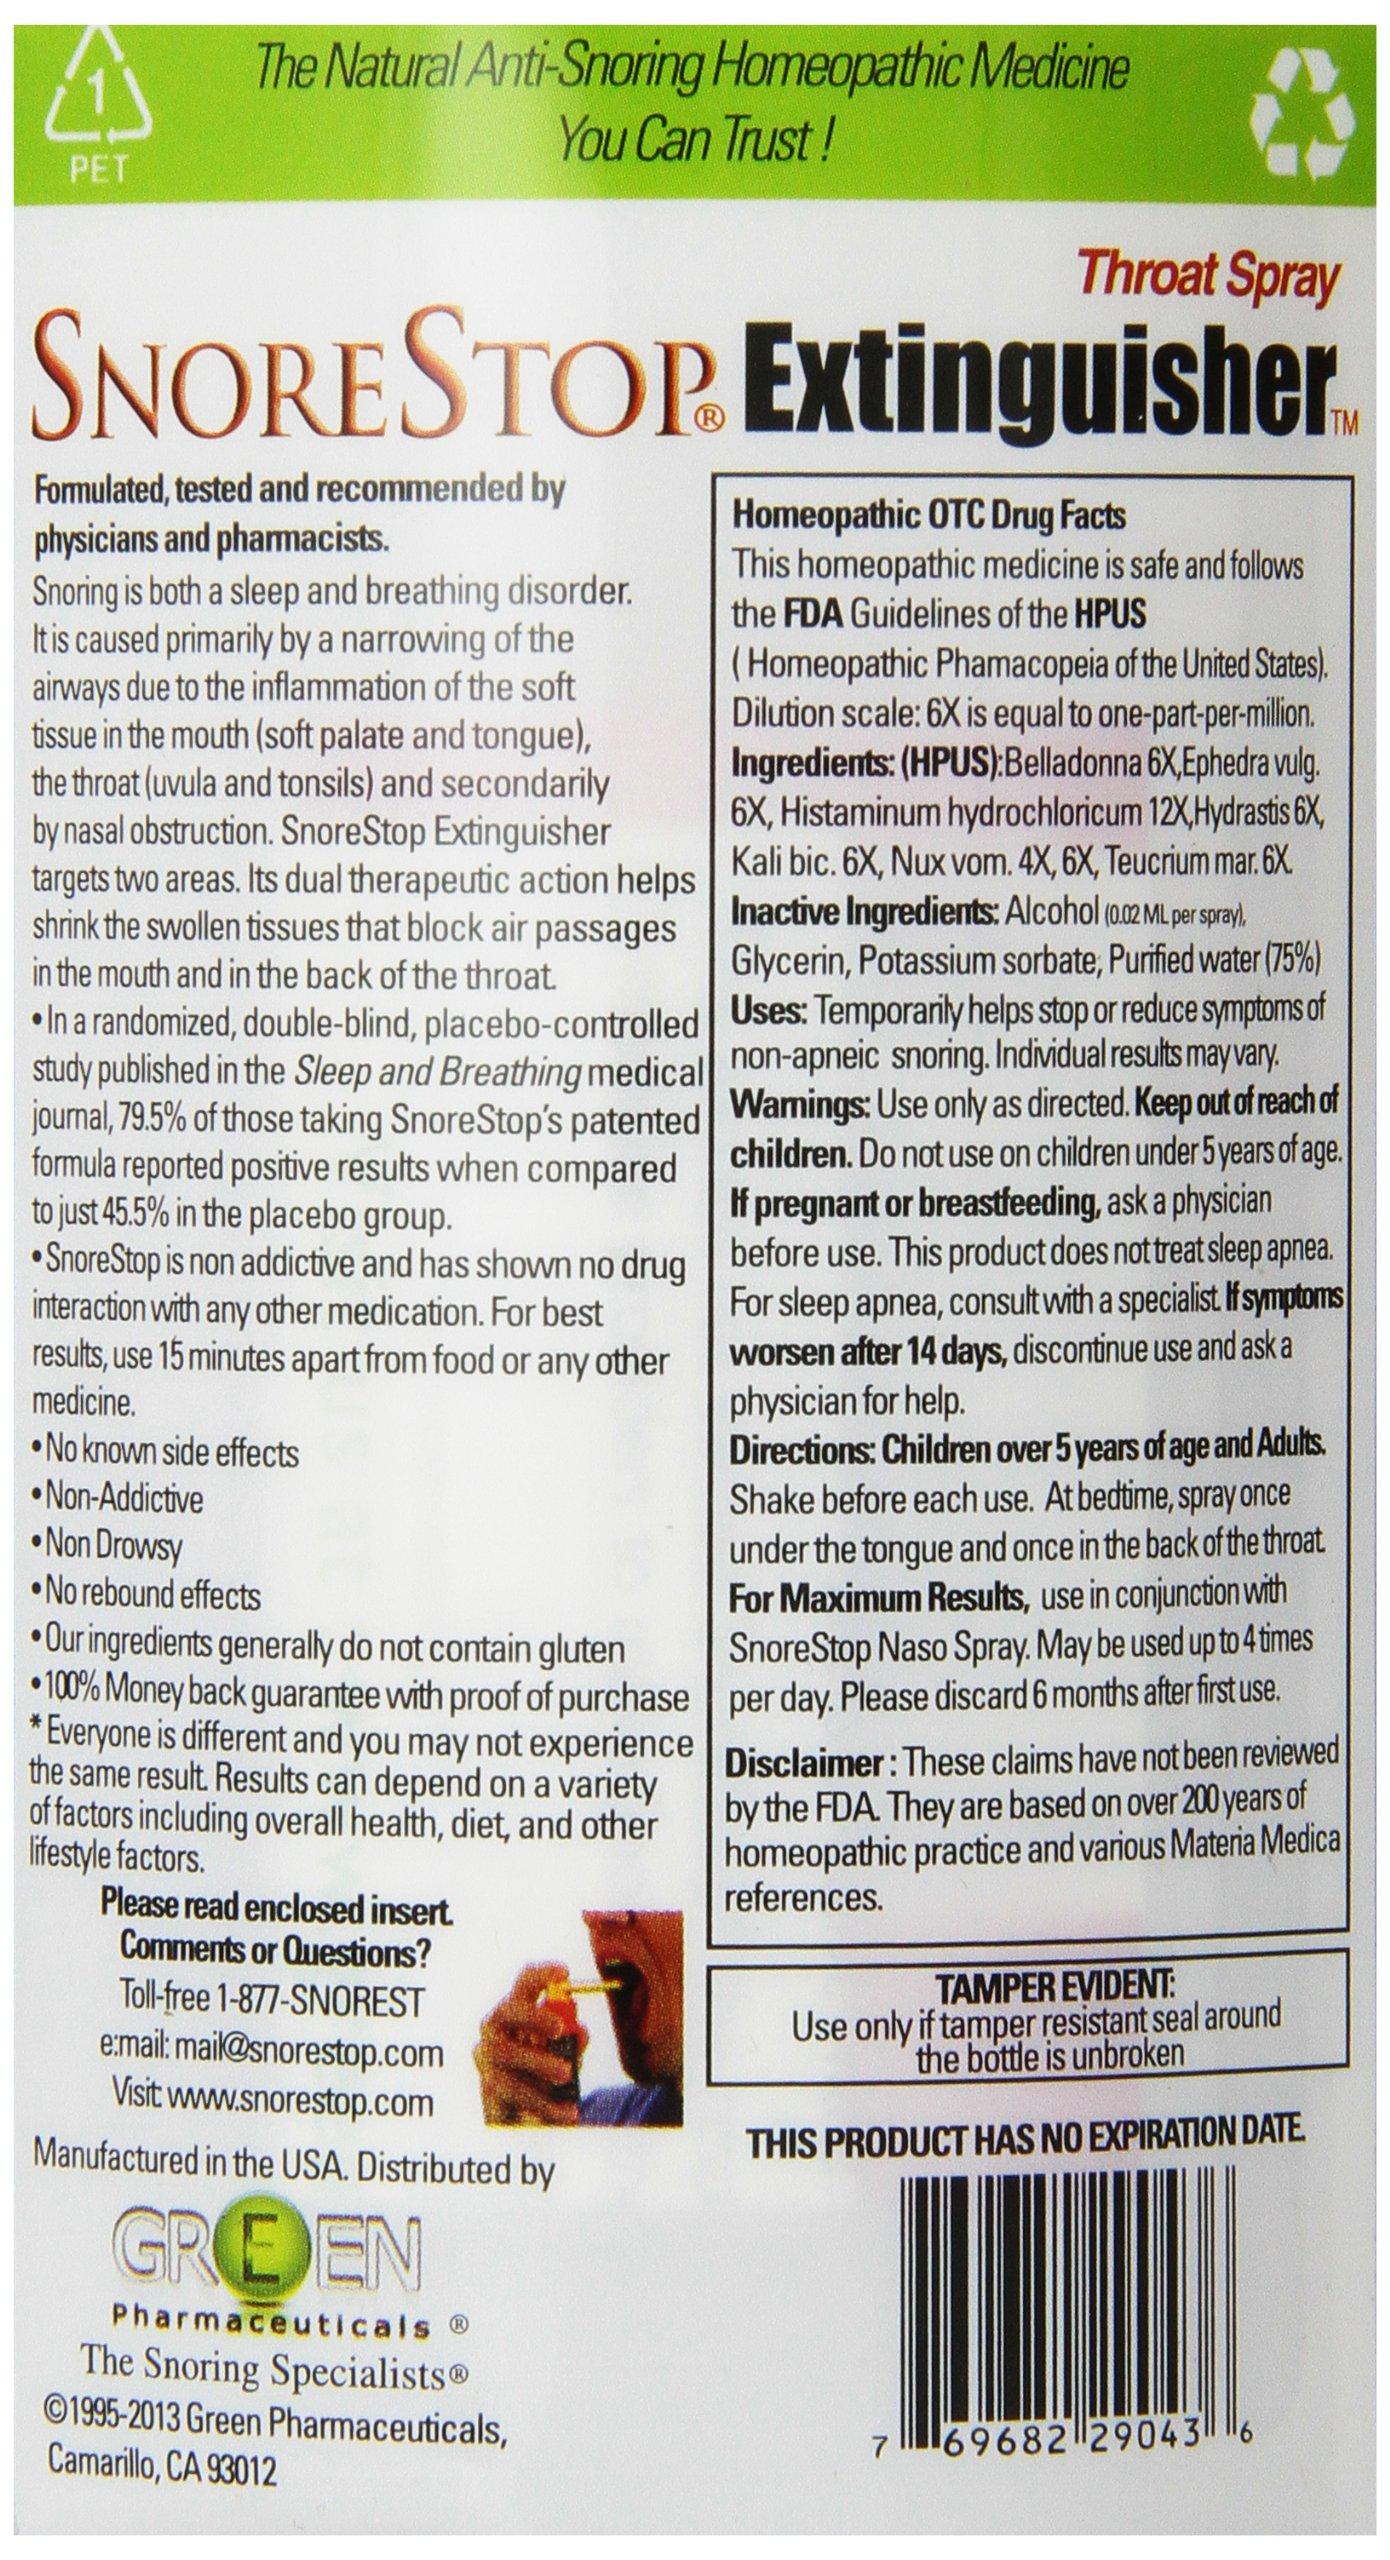 SnoreStop Extinguisher 60 Snoring Solution Pack of 2 by Snorestop